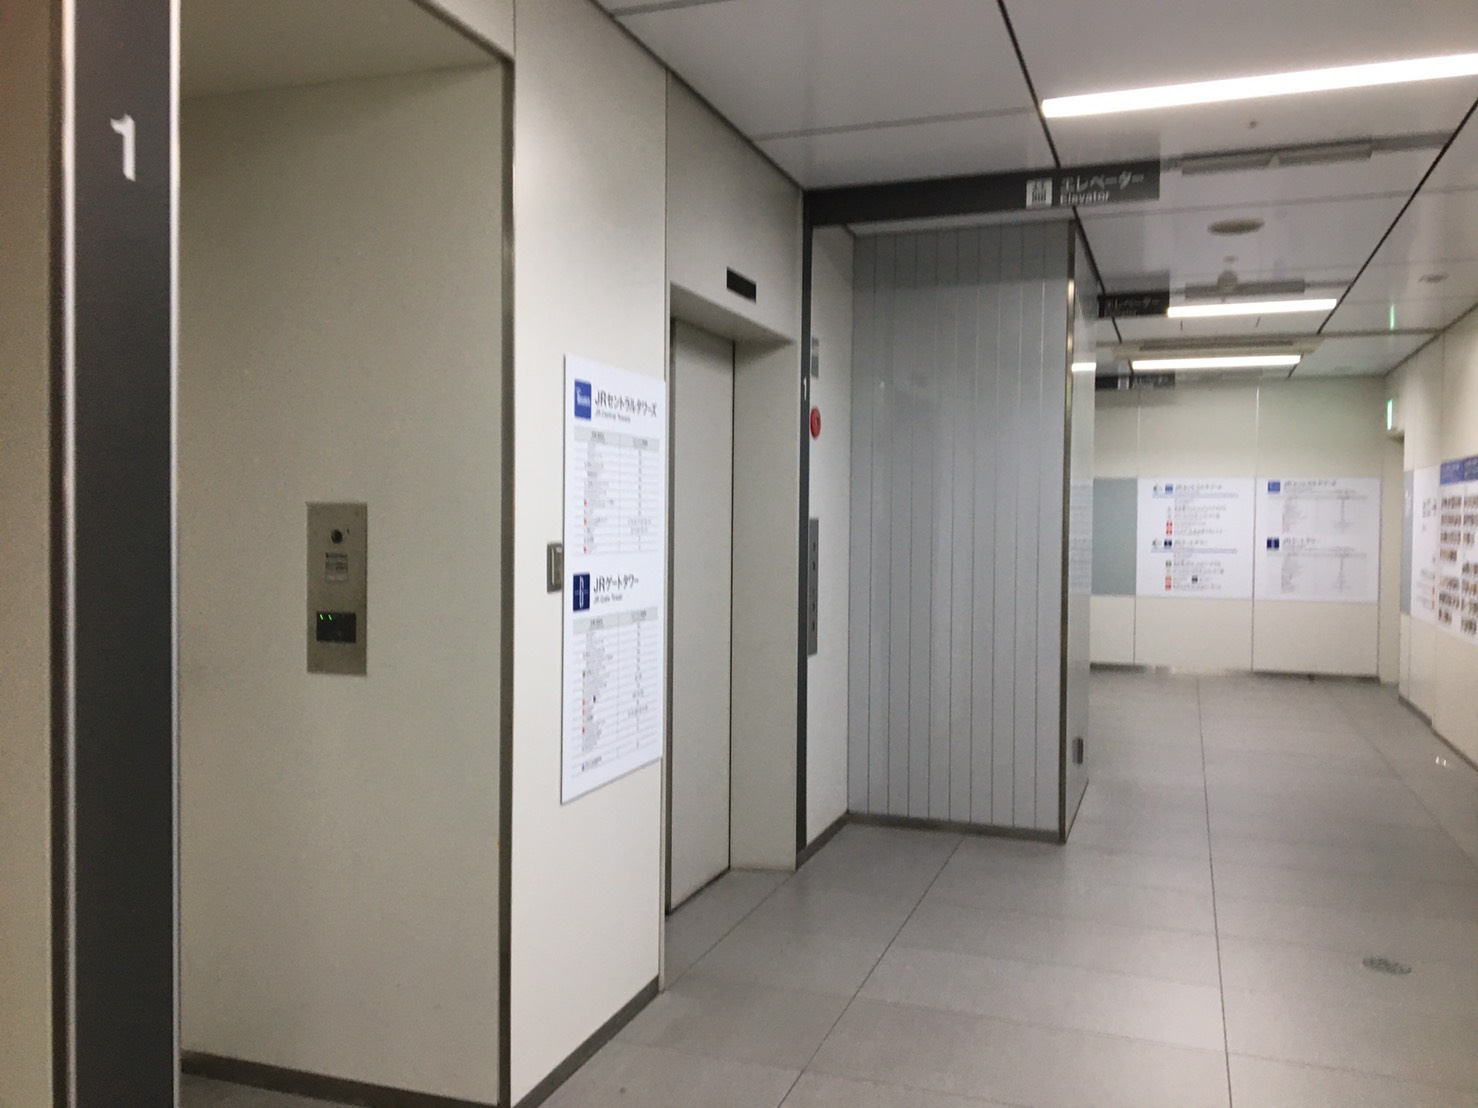 nagoya-takashimaya-10thfloor-directions